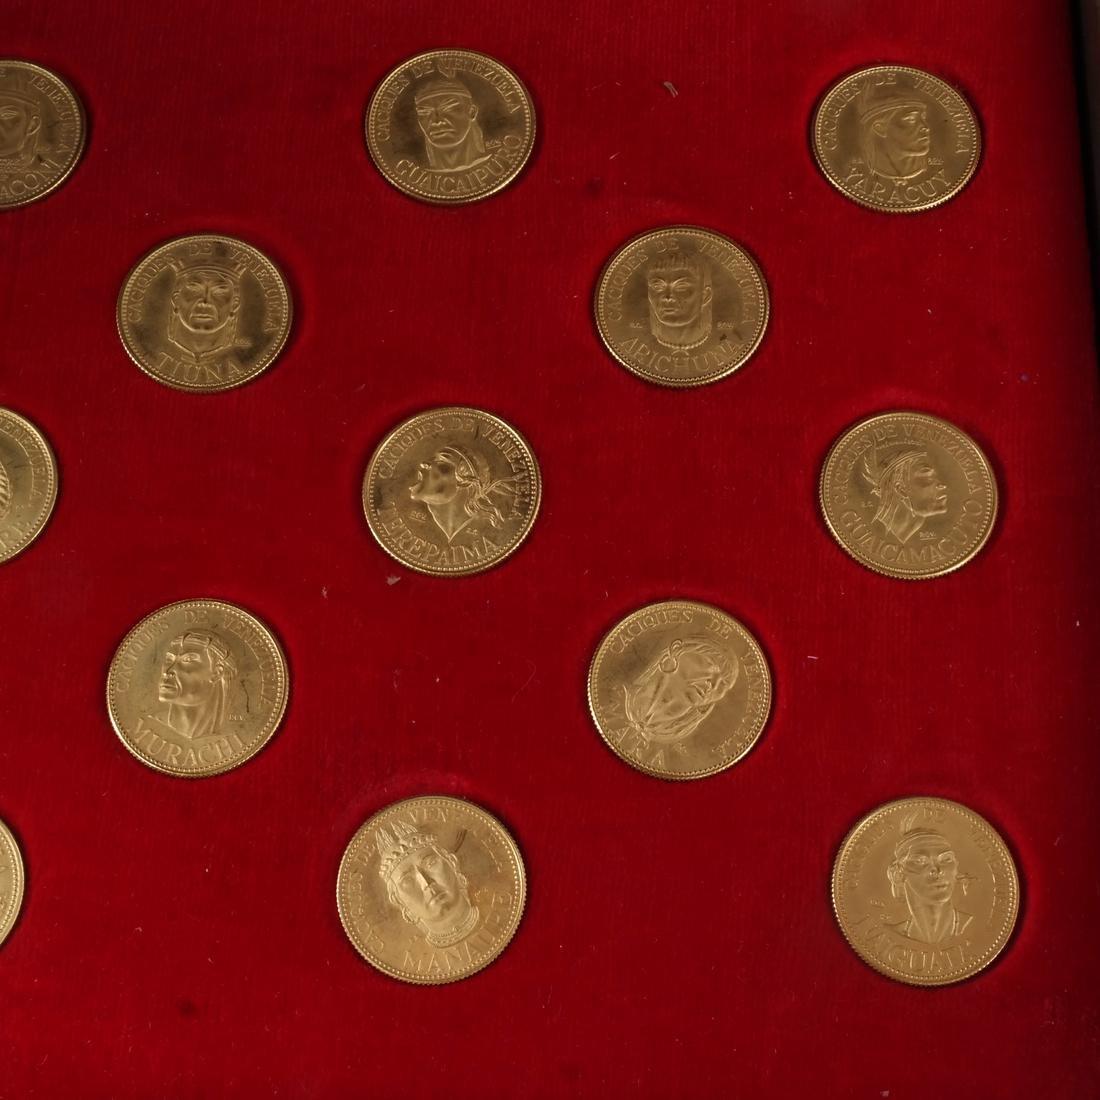 Venezuela Gold Set, 18 Coins, 1957 - 2